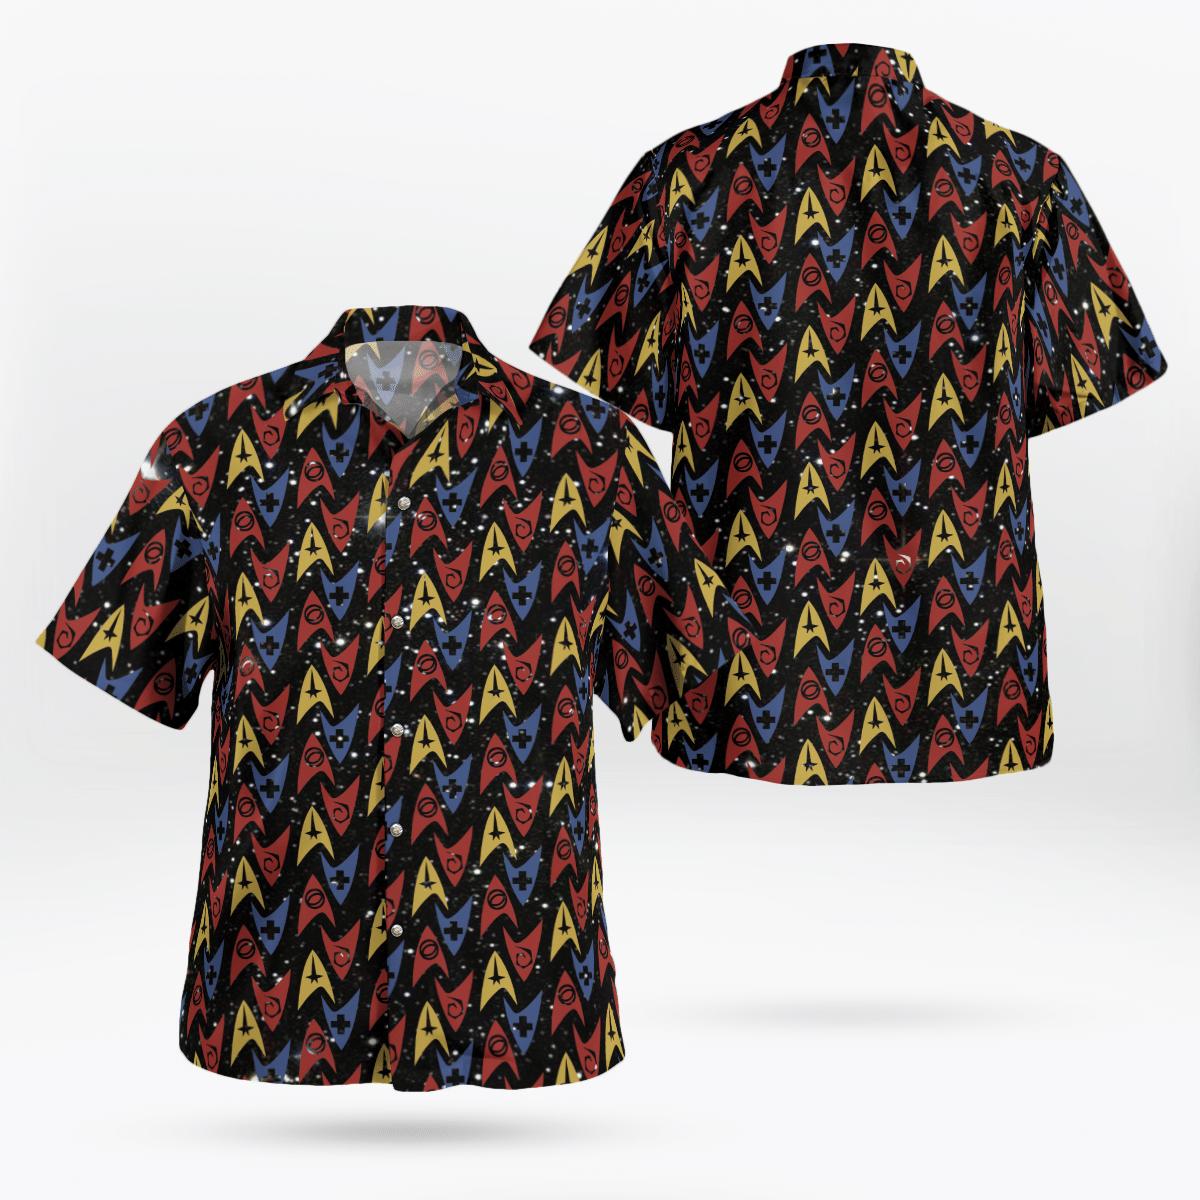 Star Trek logo Hawaiian shirt - LIMITED EDITION